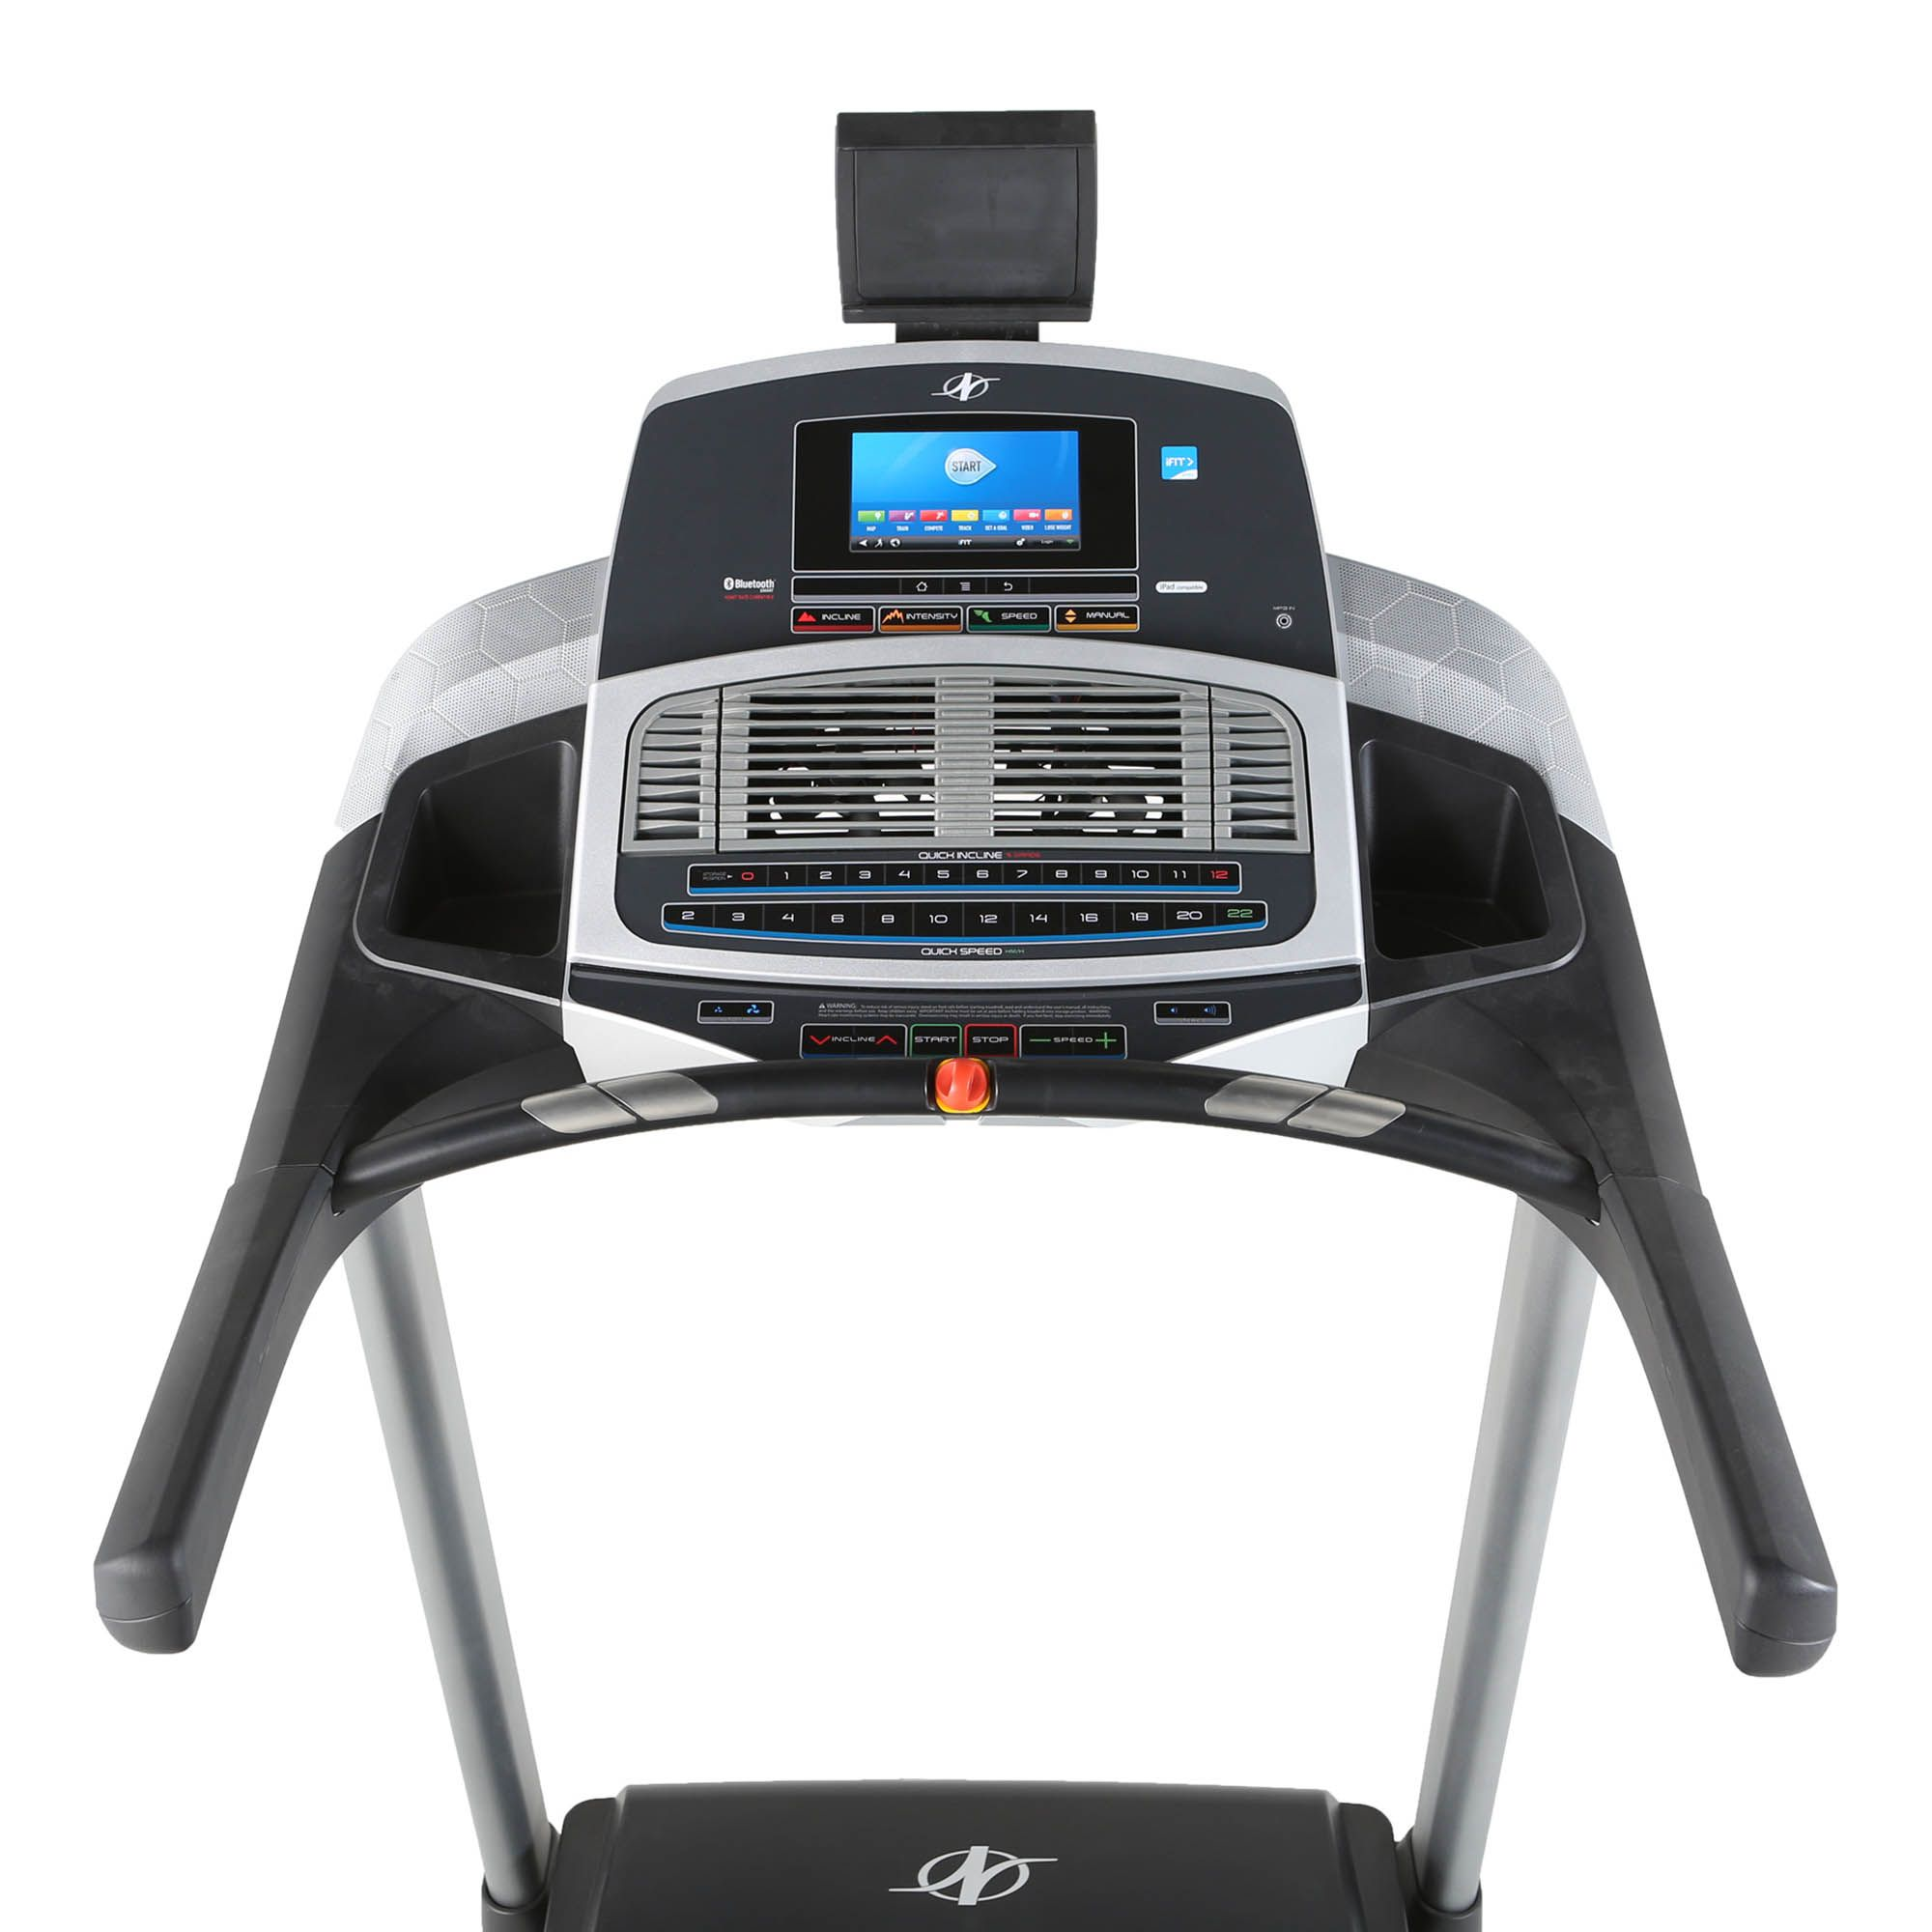 Treadmill Lubricant Nordictrack: NordicTrack T14.0 Treadmill